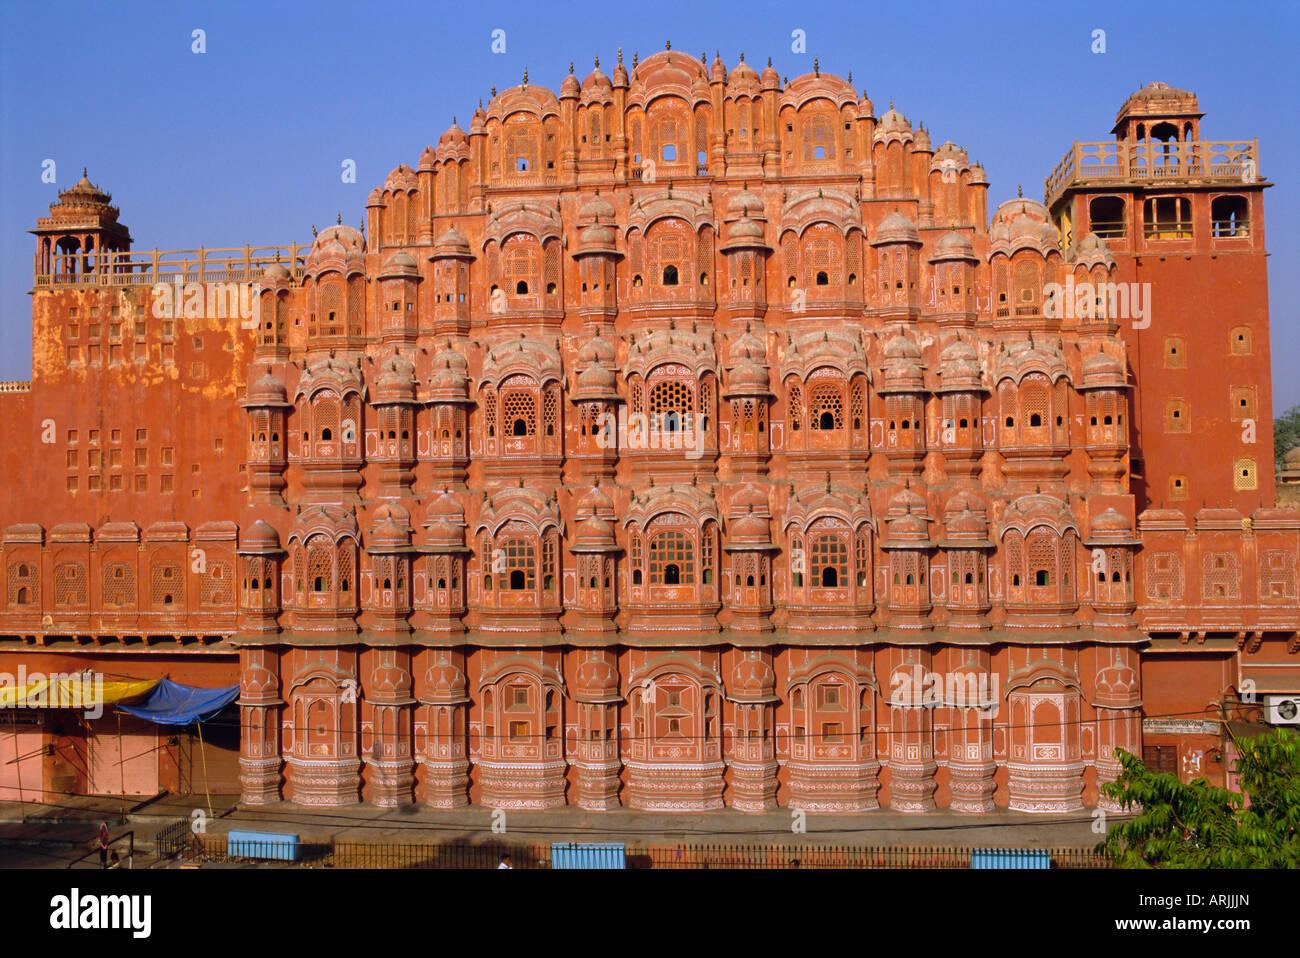 Le palais des vents, le Hawa Mahal, Jaipur, Rajasthan, Inde, Asie Photo Stock